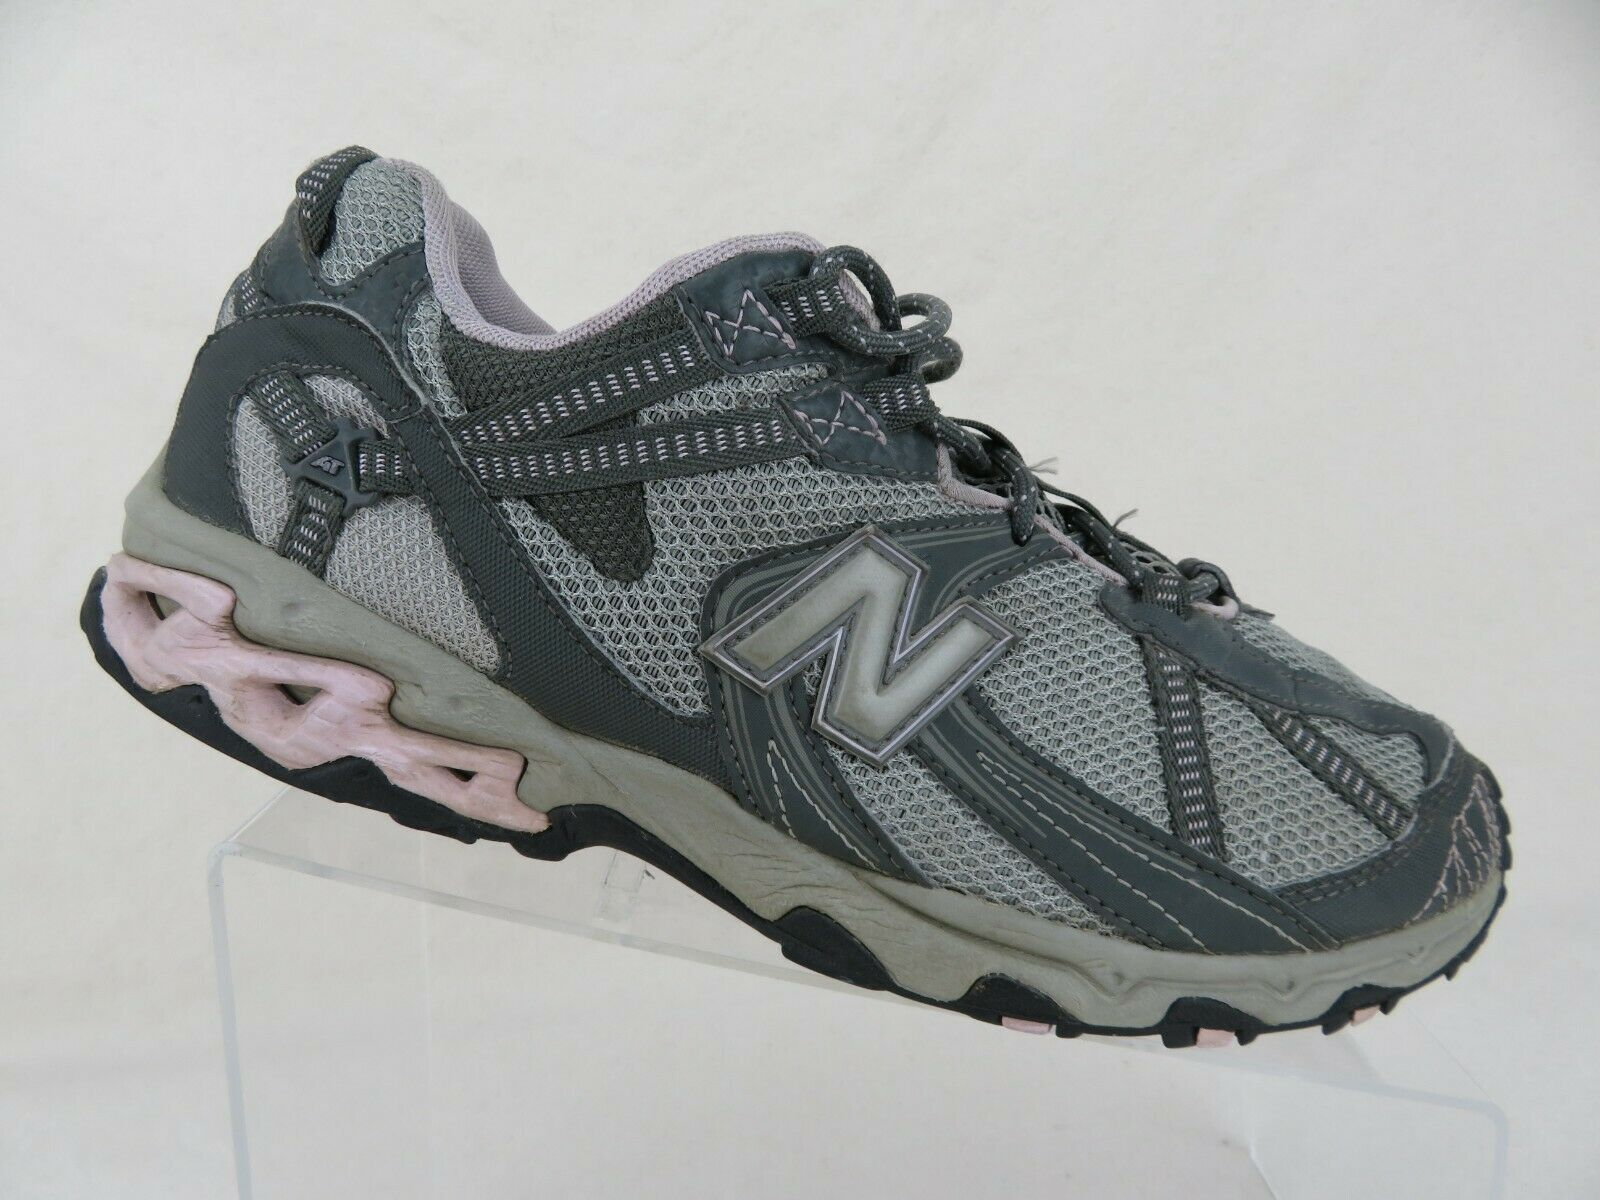 29+ New balance trail shoes ideas info